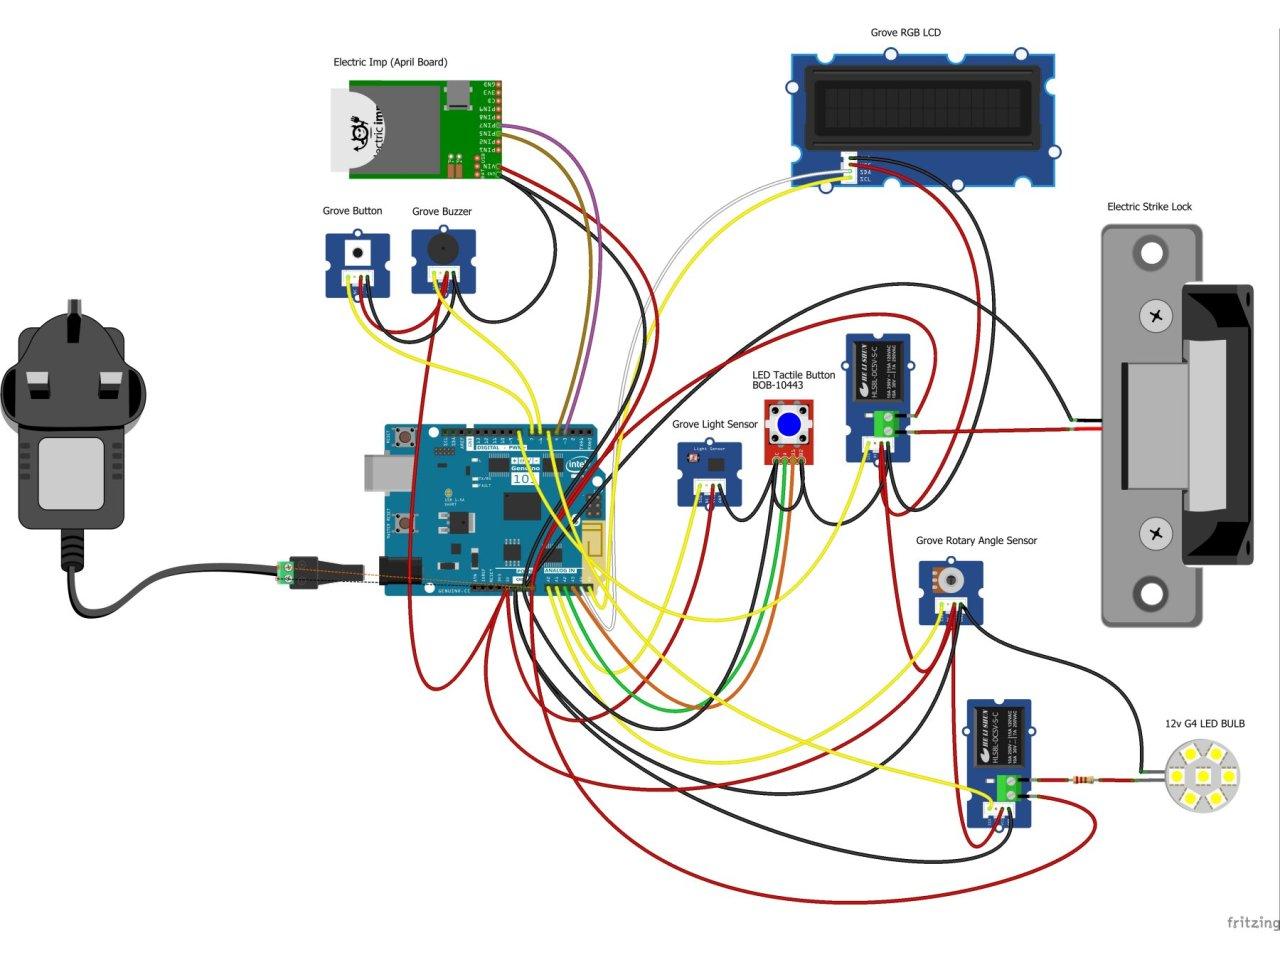 medium resolution of electric strike lock wiring diagram